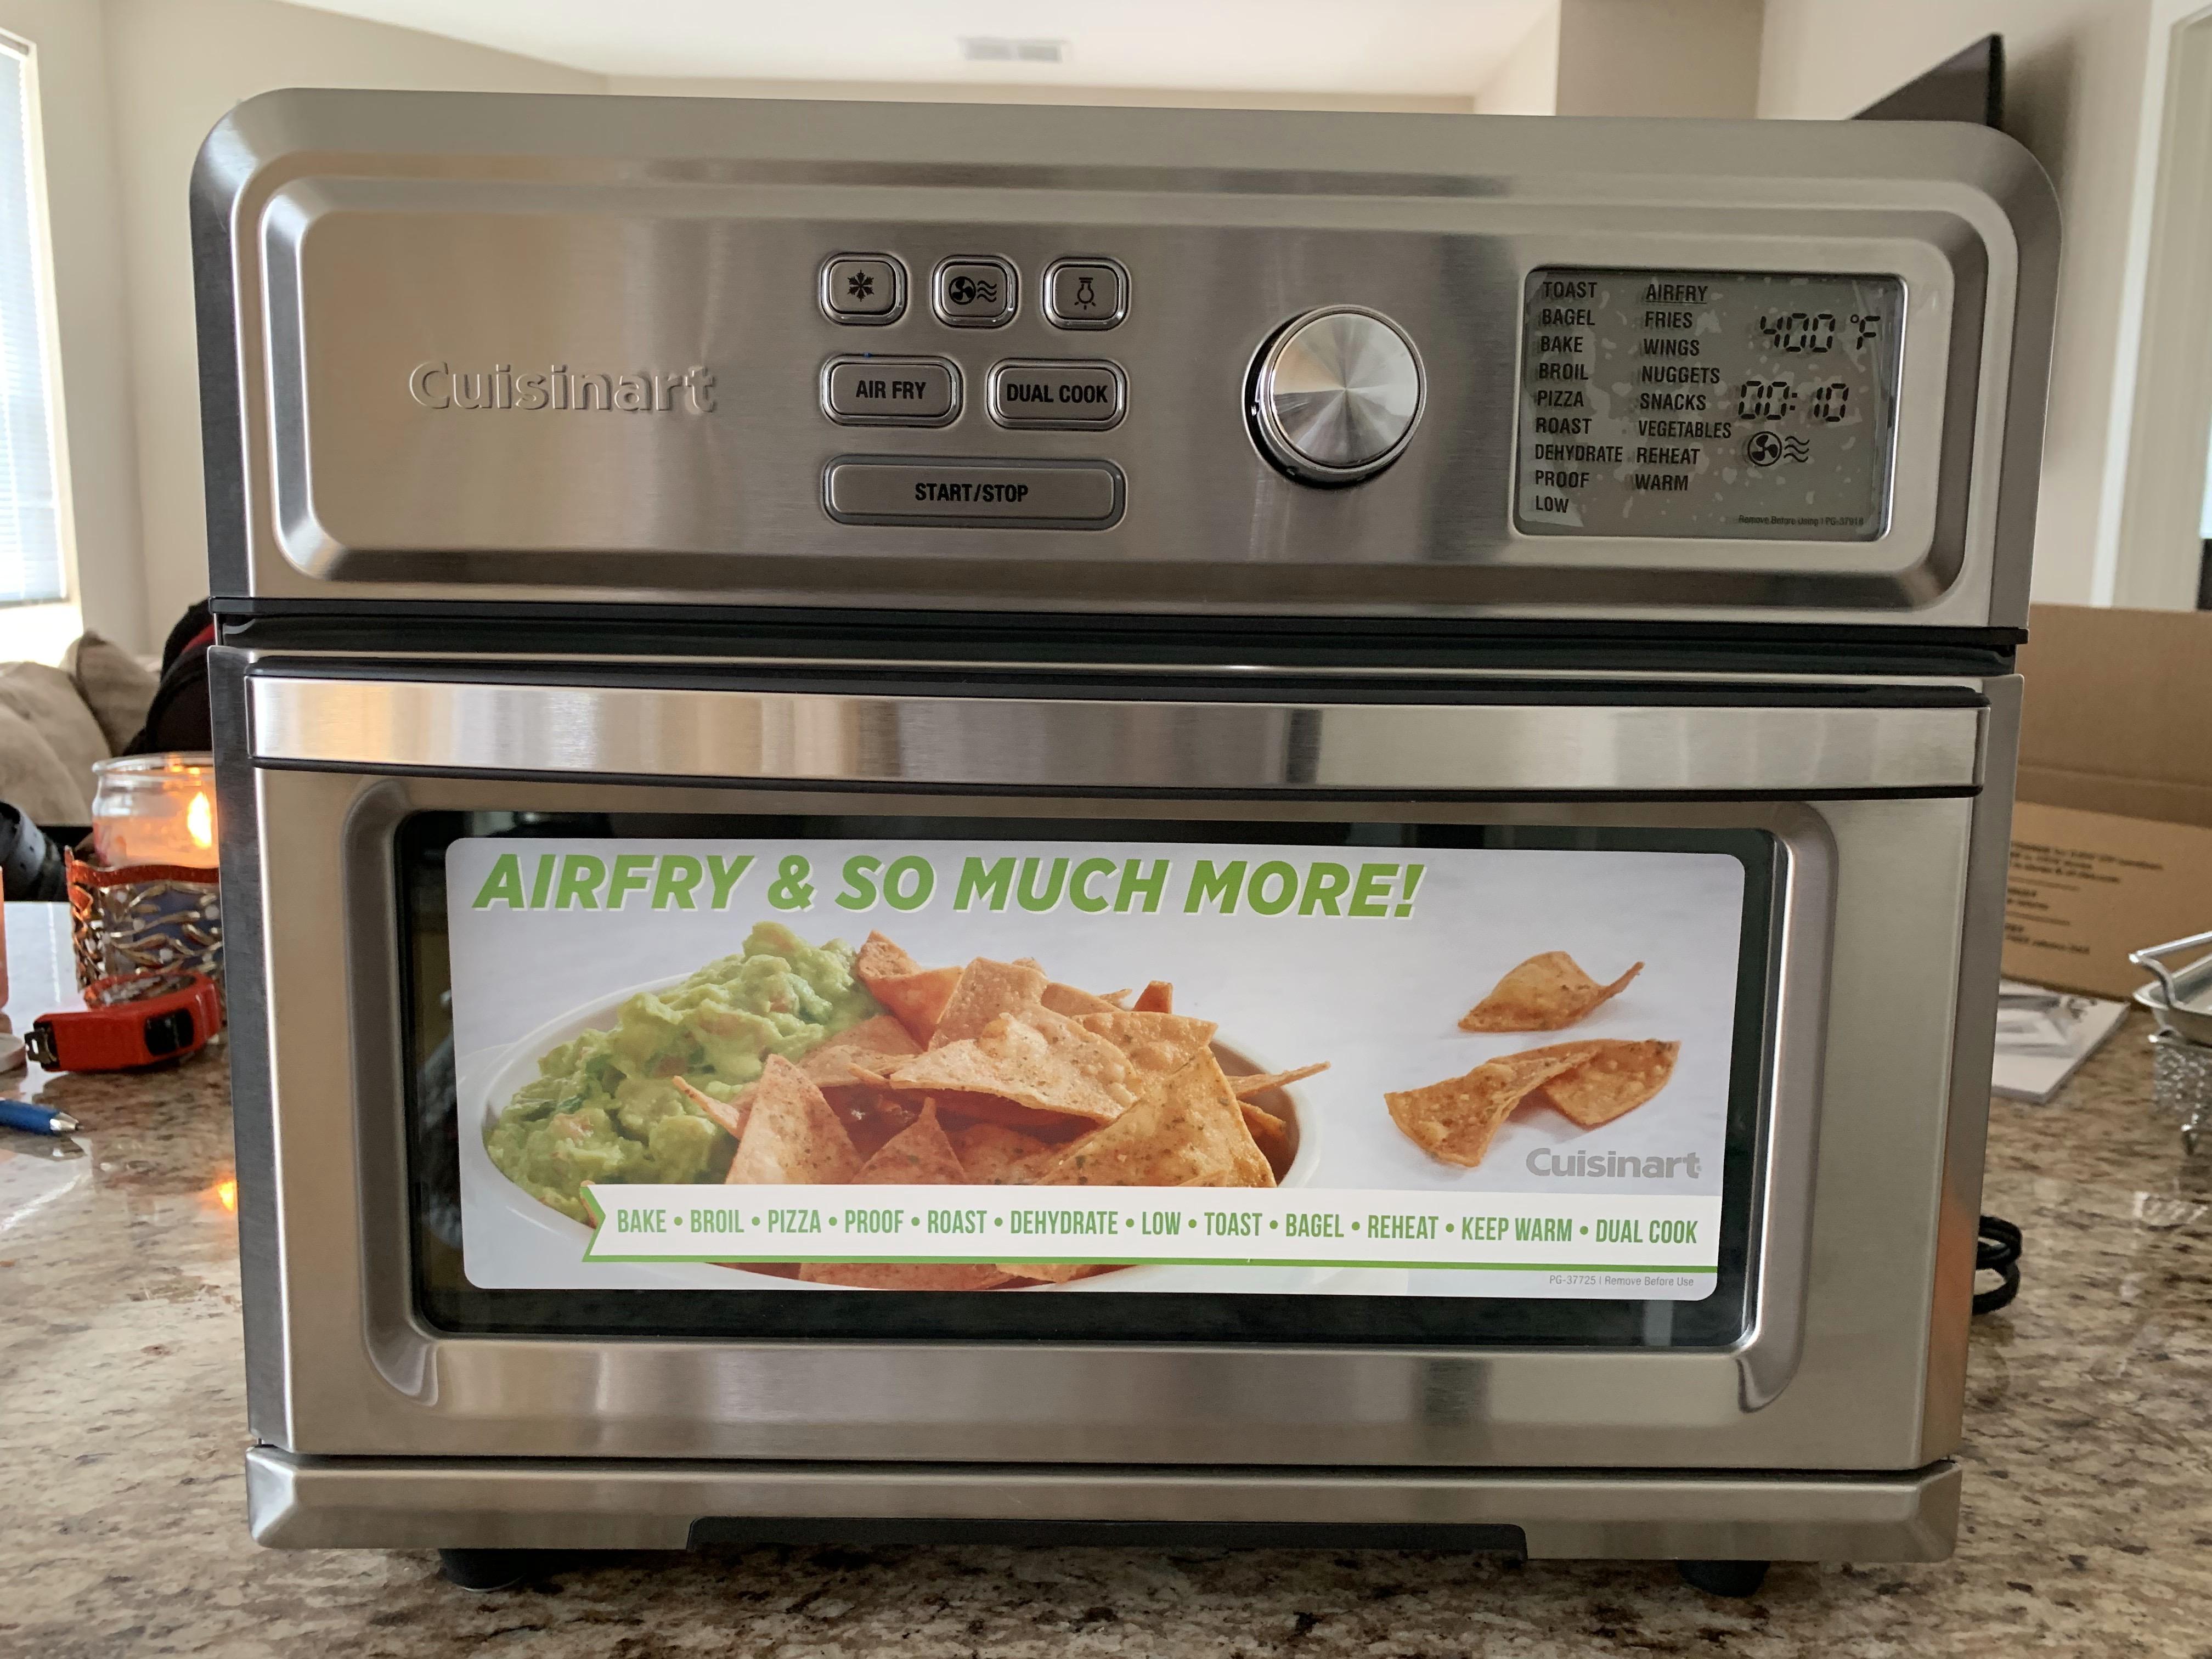 Cuisinart S Air Fryer Toaster Oven Finger Foods Made A Bit Healthier